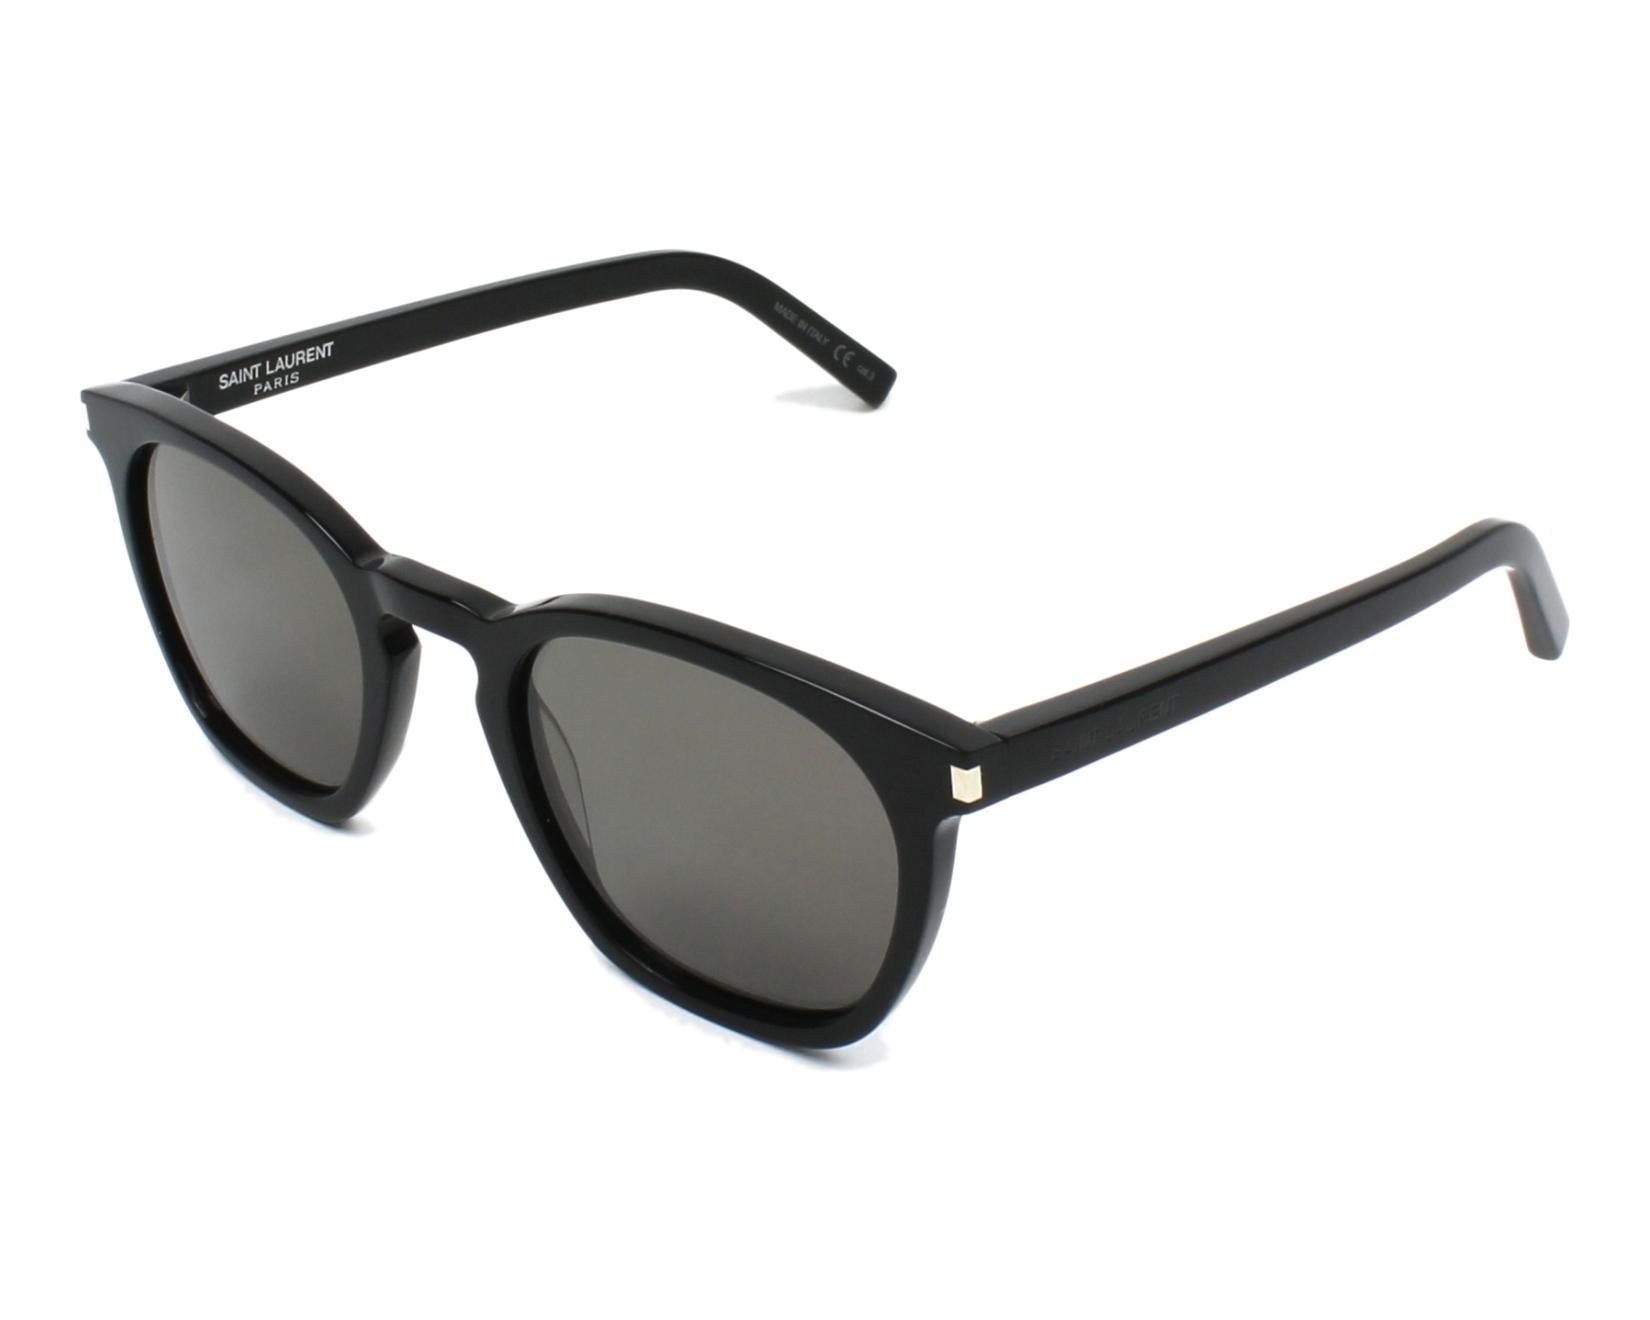 57d6b15f867 Sunglasses Yves Saint Laurent SL-28 022 51-23 Black profile view